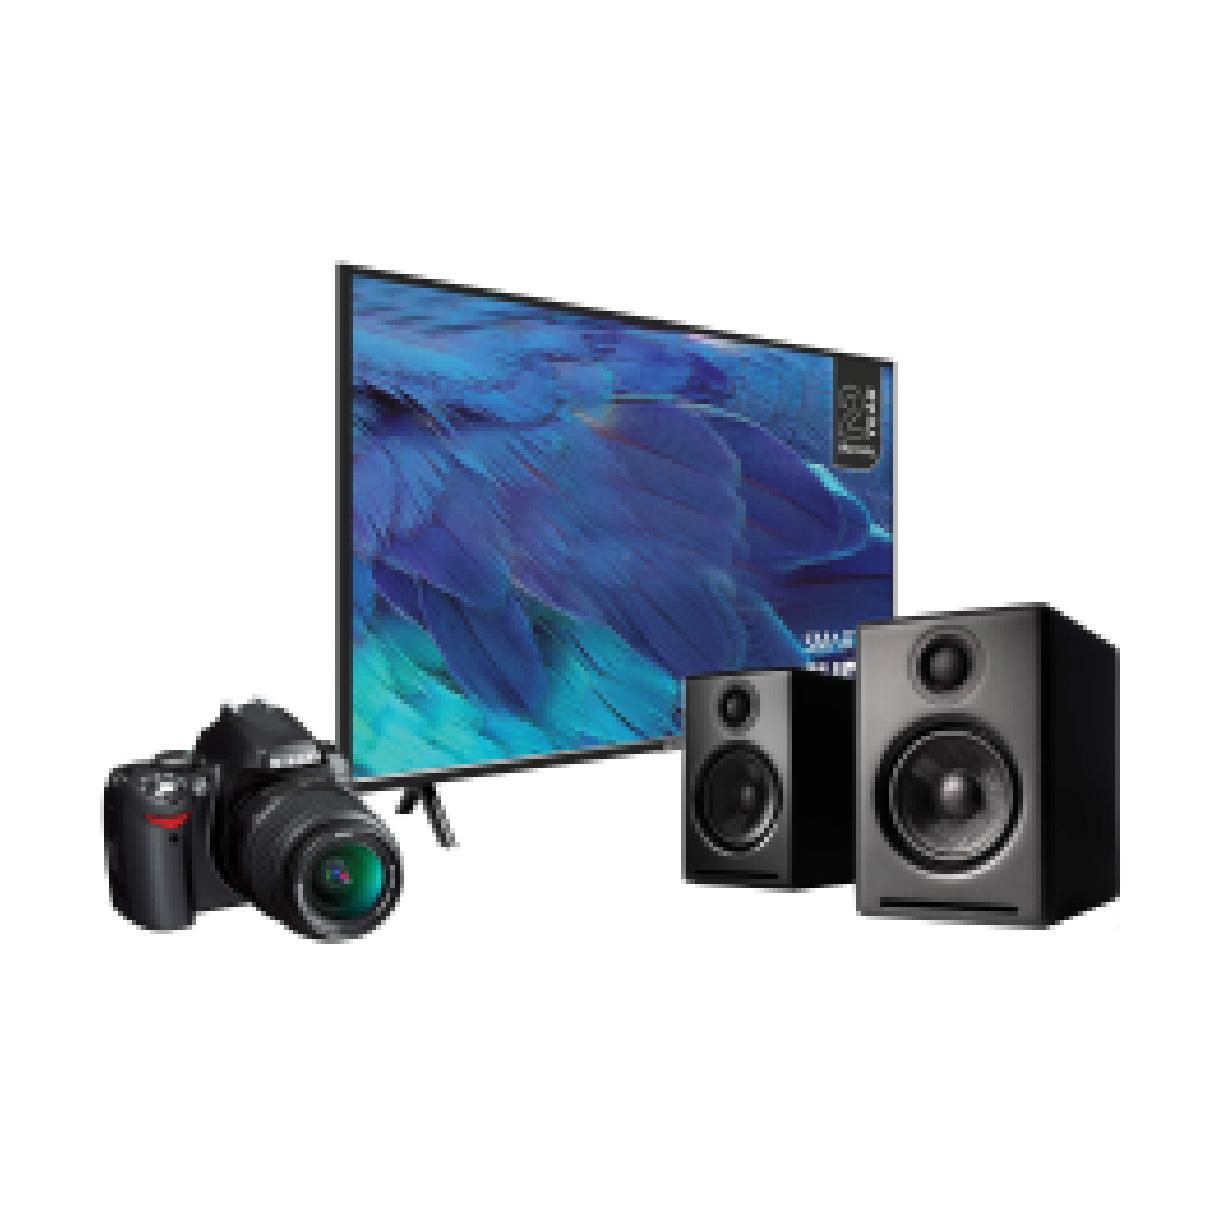 ТВ, Видео и Аудиотехника